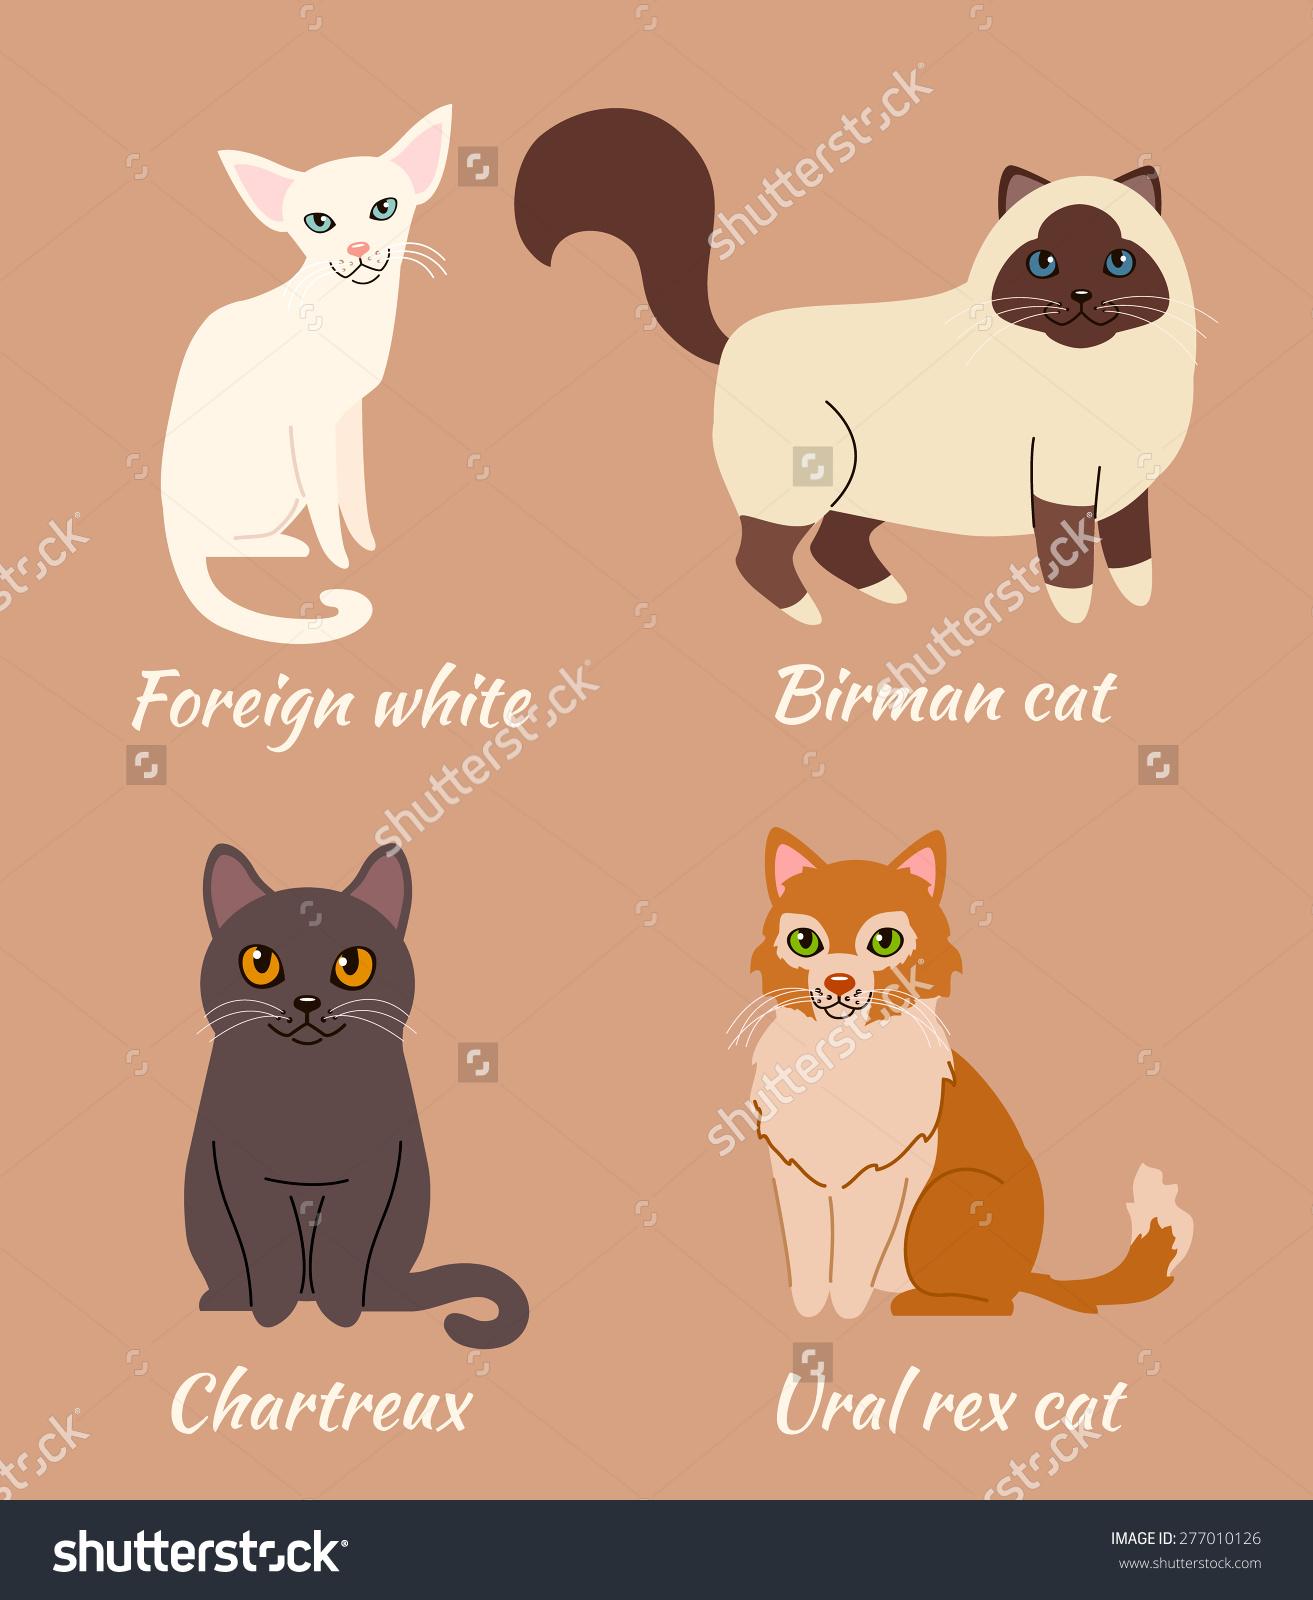 Birman Cat clipart #19, Download drawings